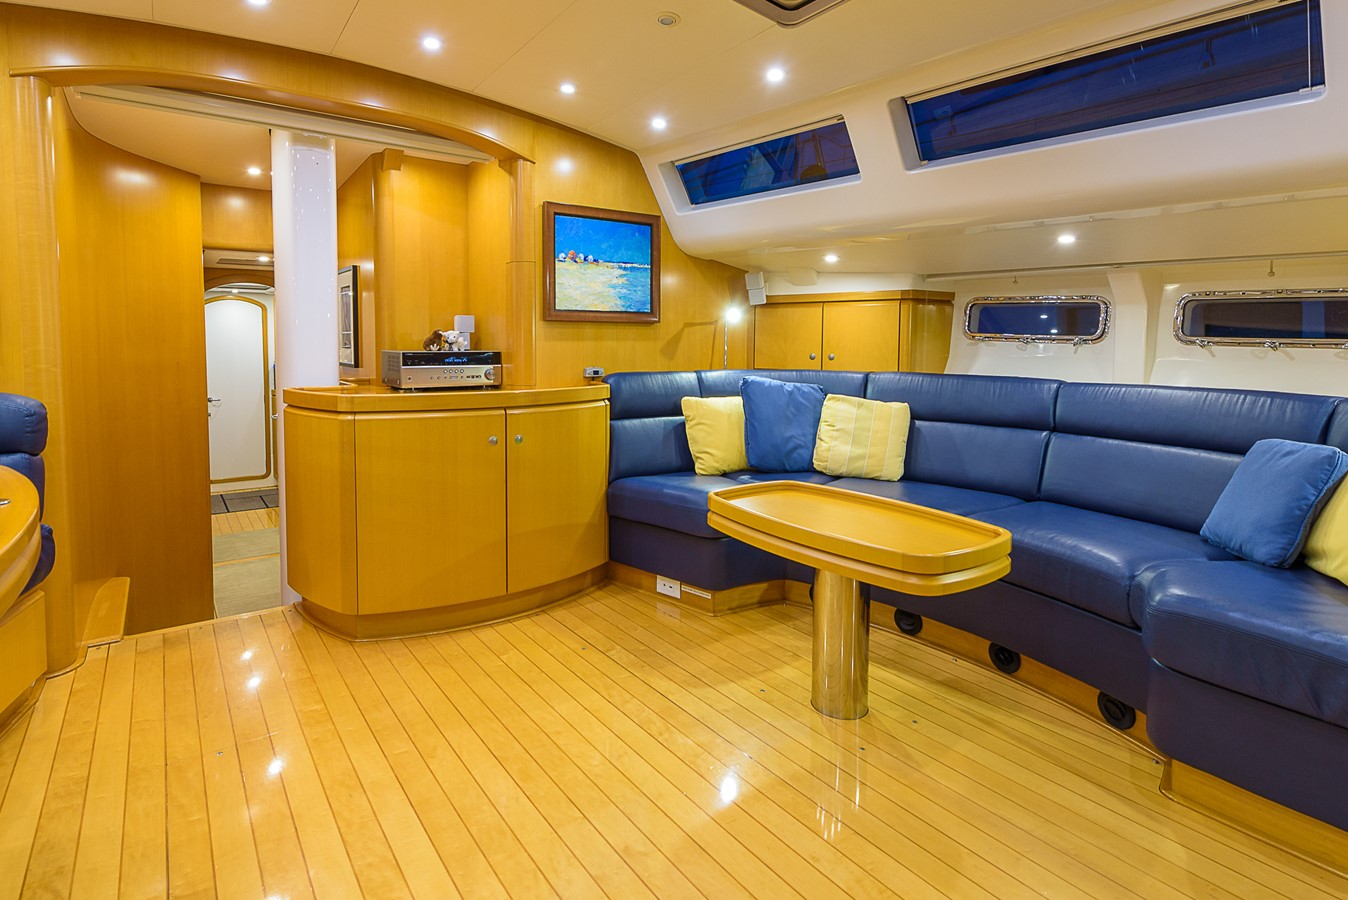 Salon, Stbd. 2000 KELLY ARCHER Van de Stadt Cruising Sailboat Cruising Sailboat 2481194